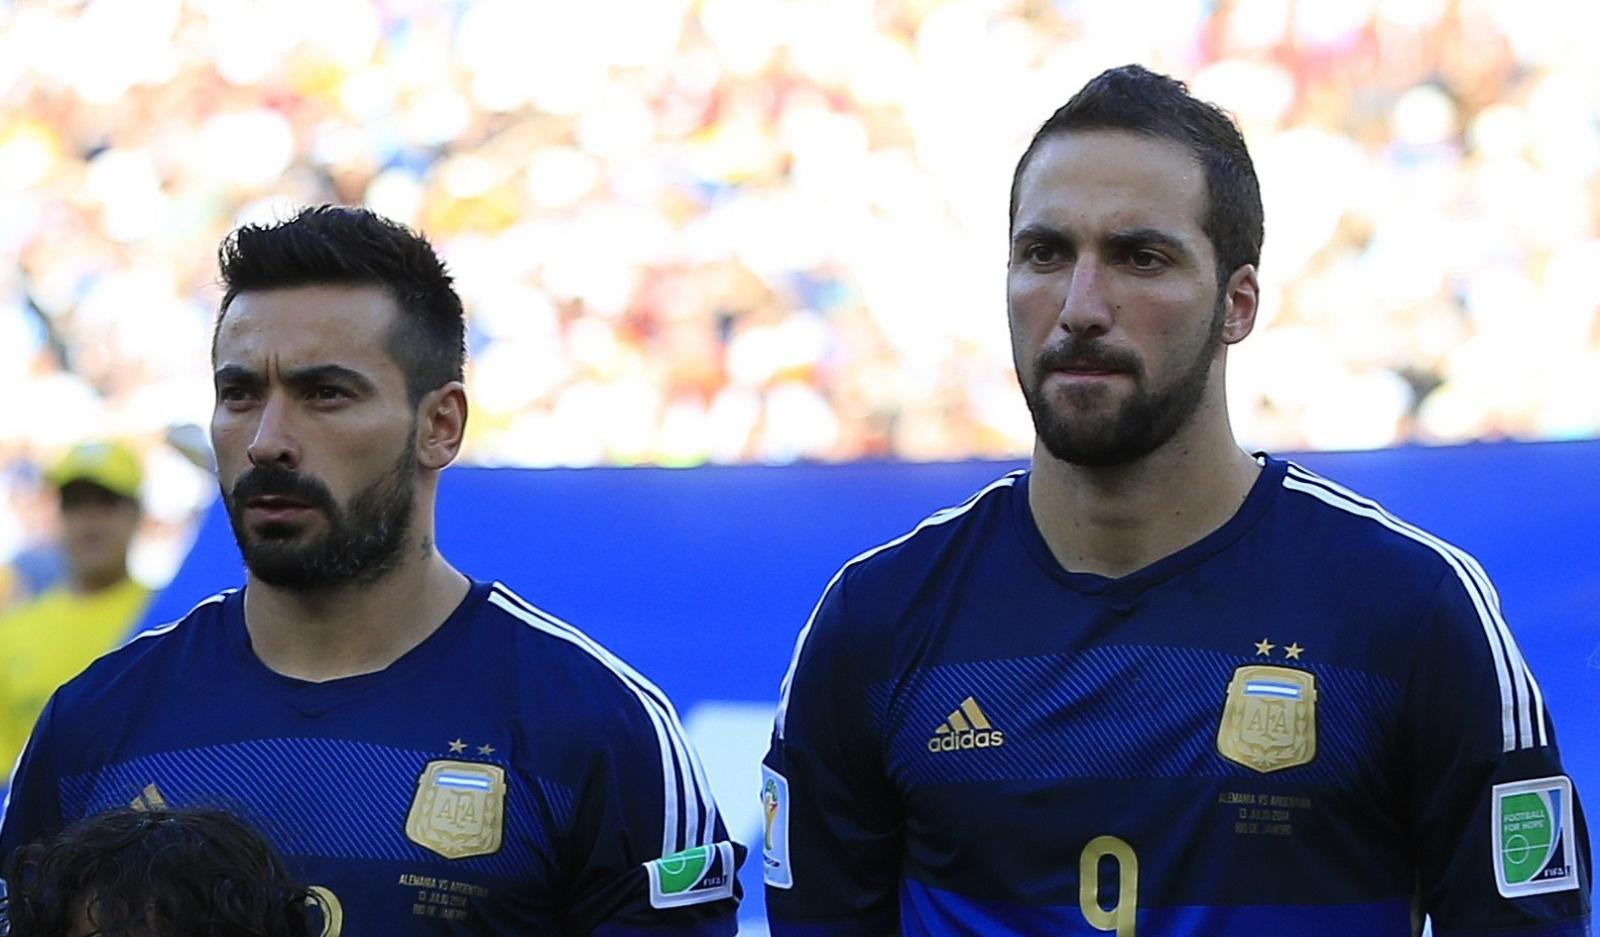 Gonzalo Higuain and Ezequiel Lavezzi